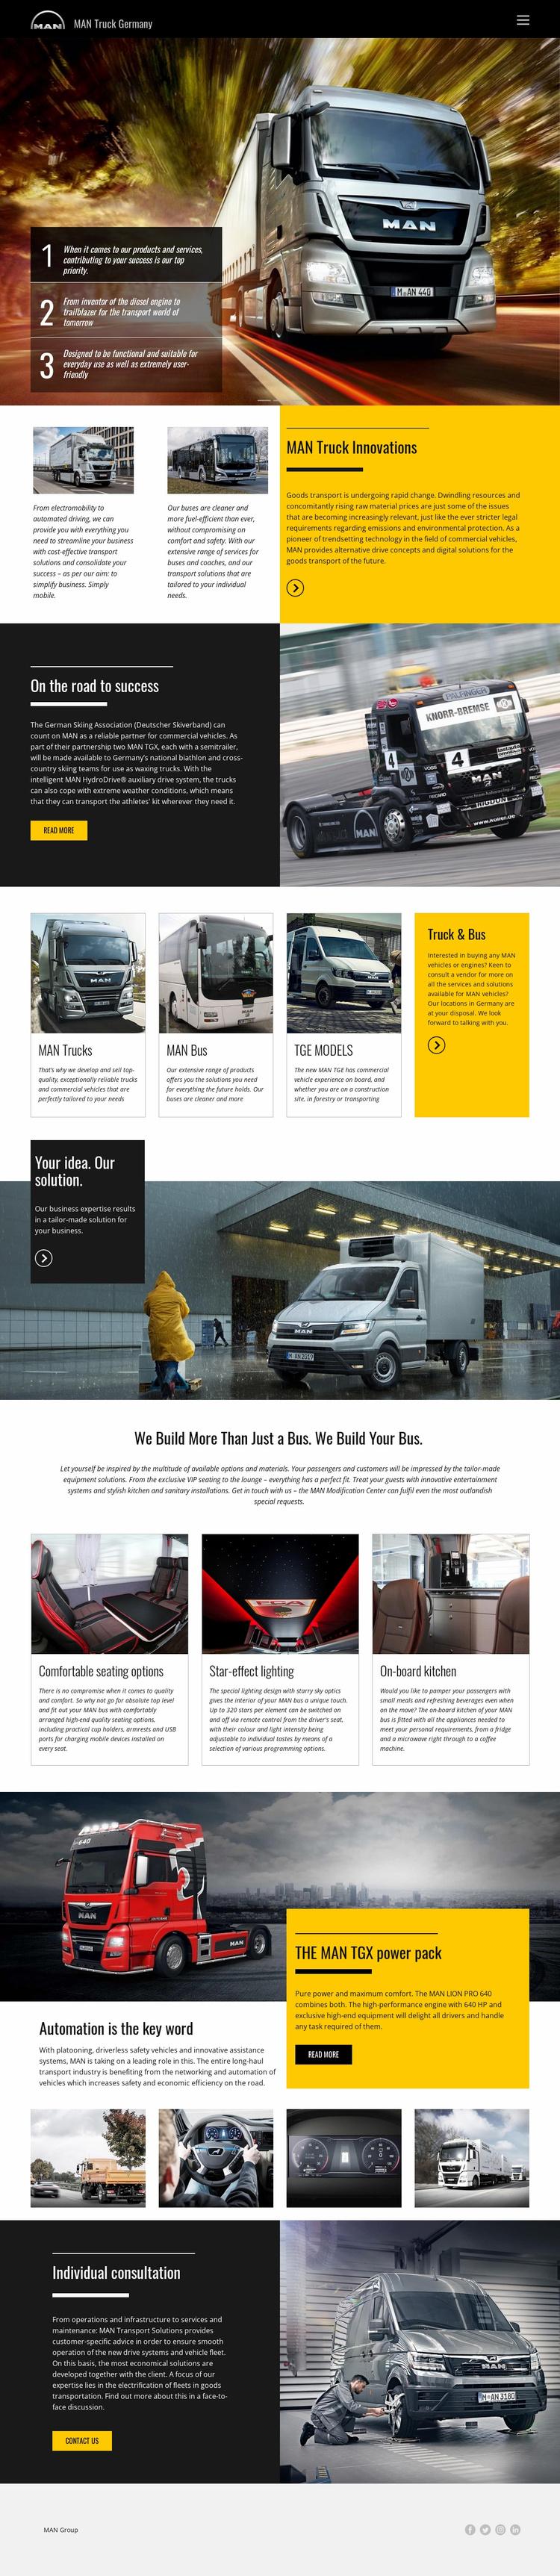 Man trucks for transportation Website Template